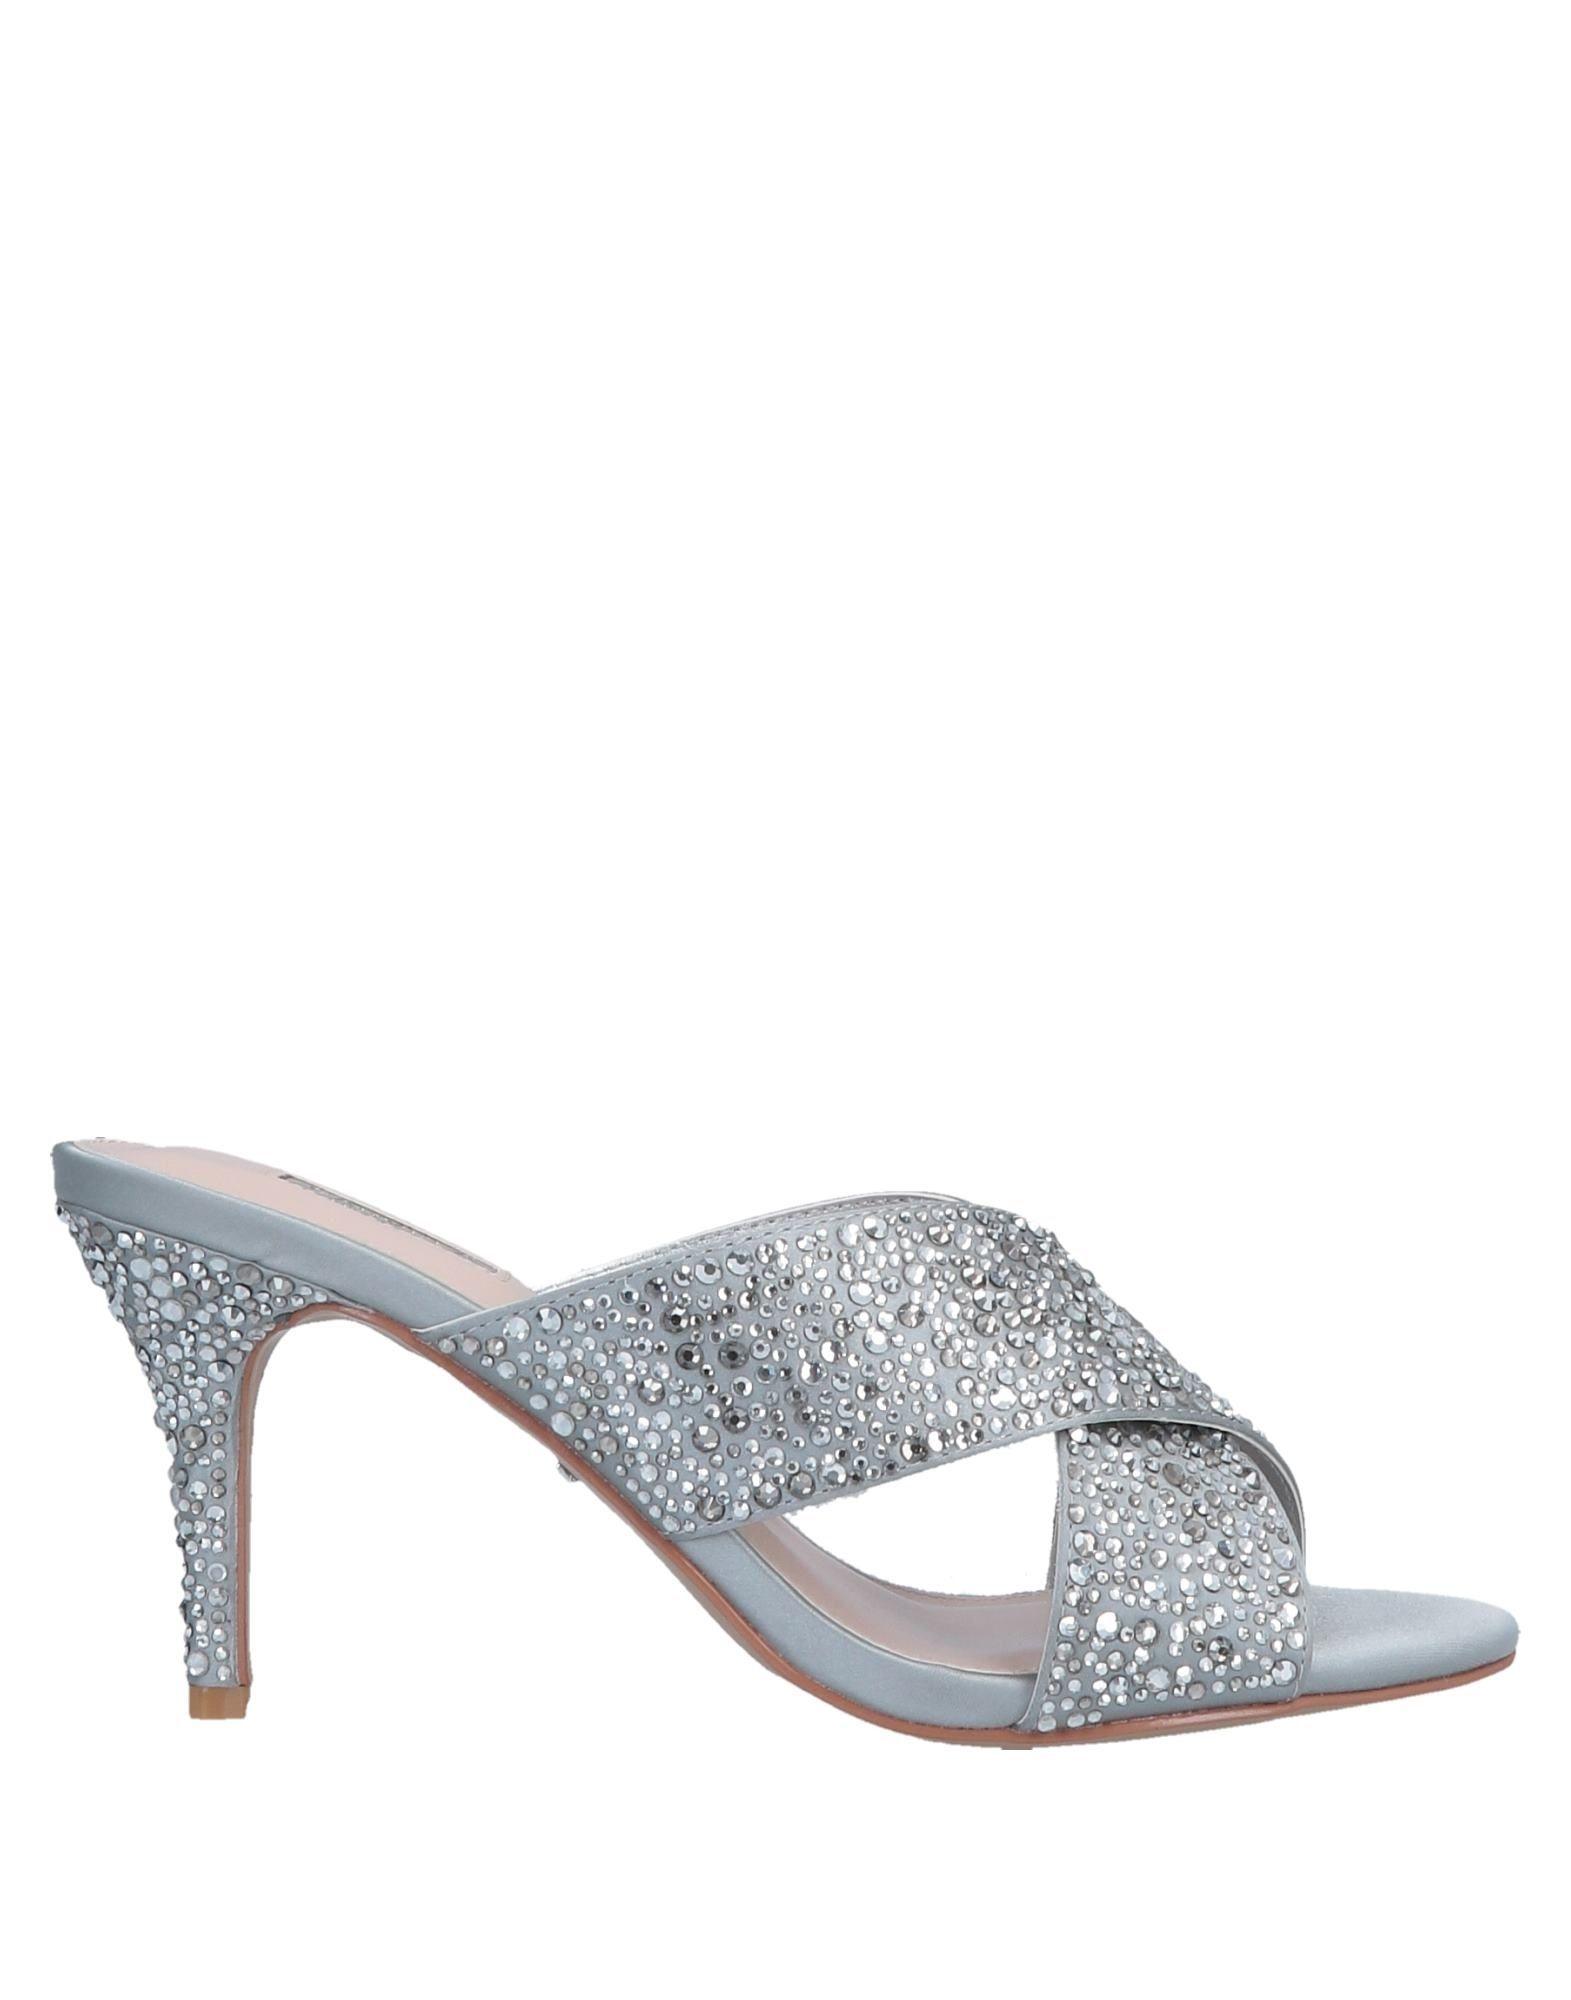 Carvela Silver Embellished Heeled Mules